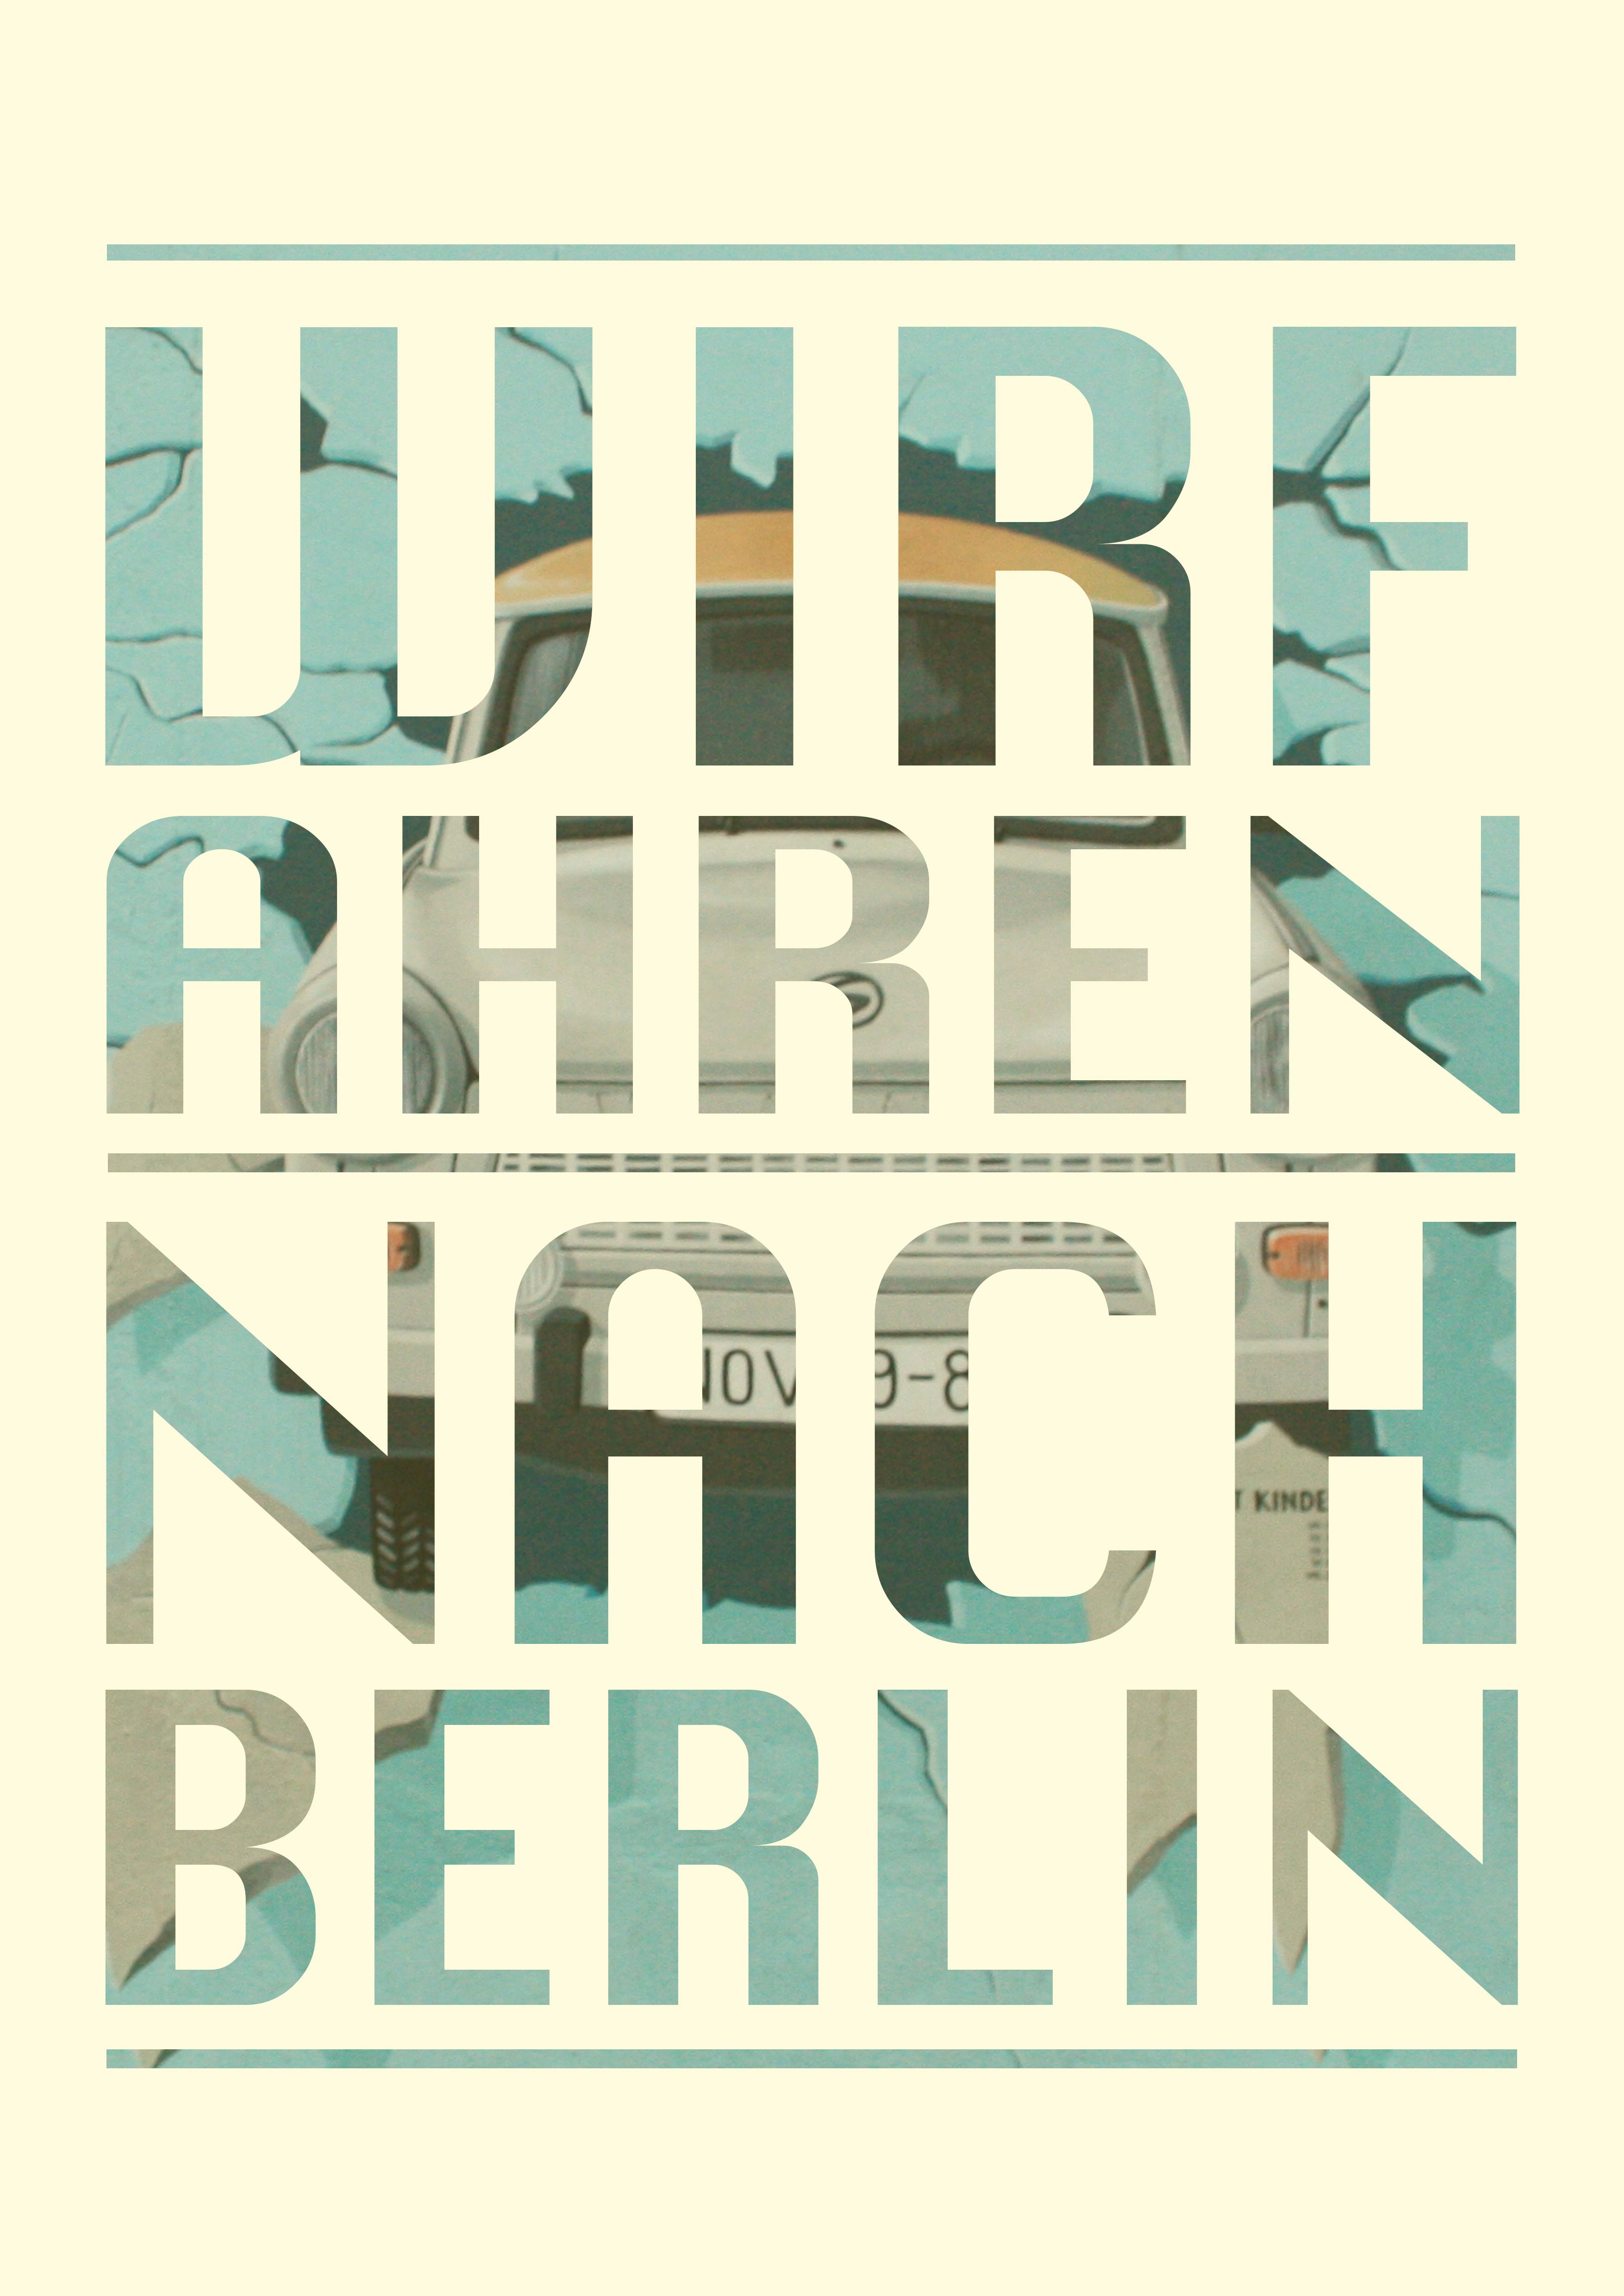 Plakatdesign - Wir fahren nach Berli